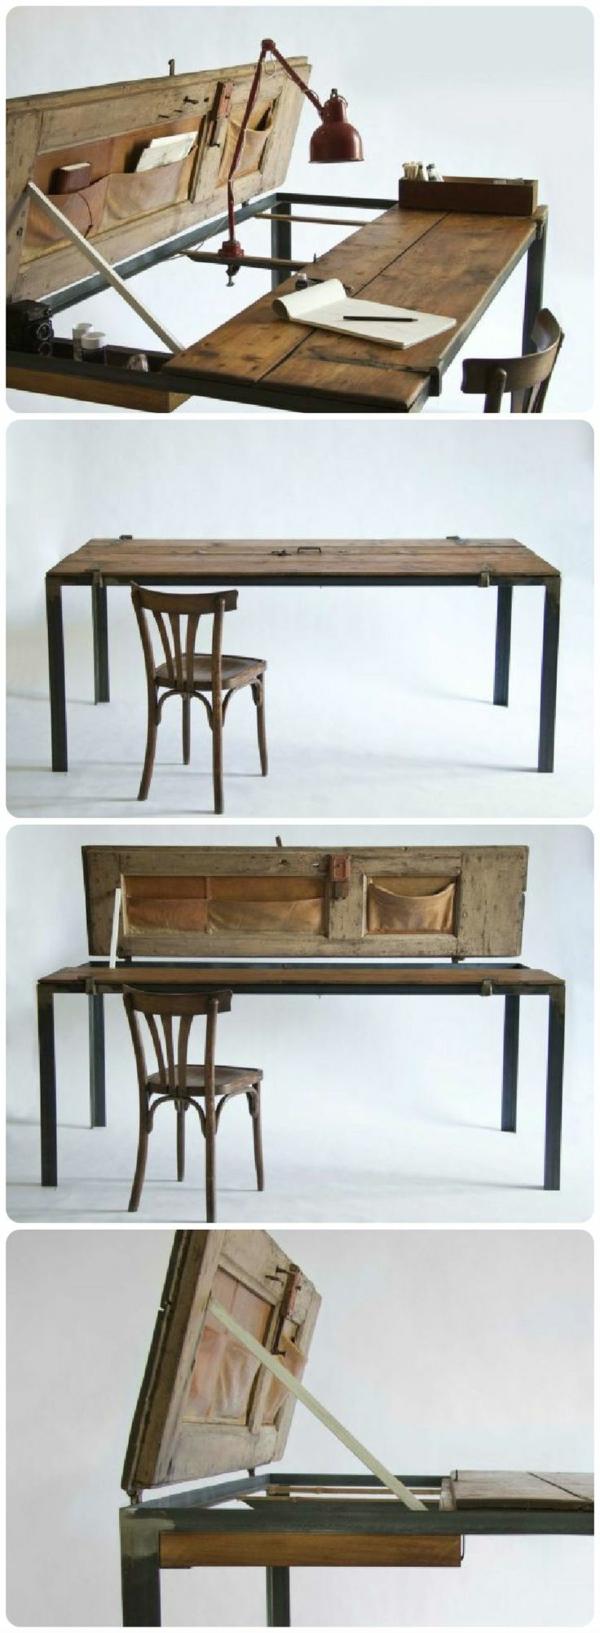 wohnzimmer m bel neu gestalten ikea m bel online shop. Black Bedroom Furniture Sets. Home Design Ideas